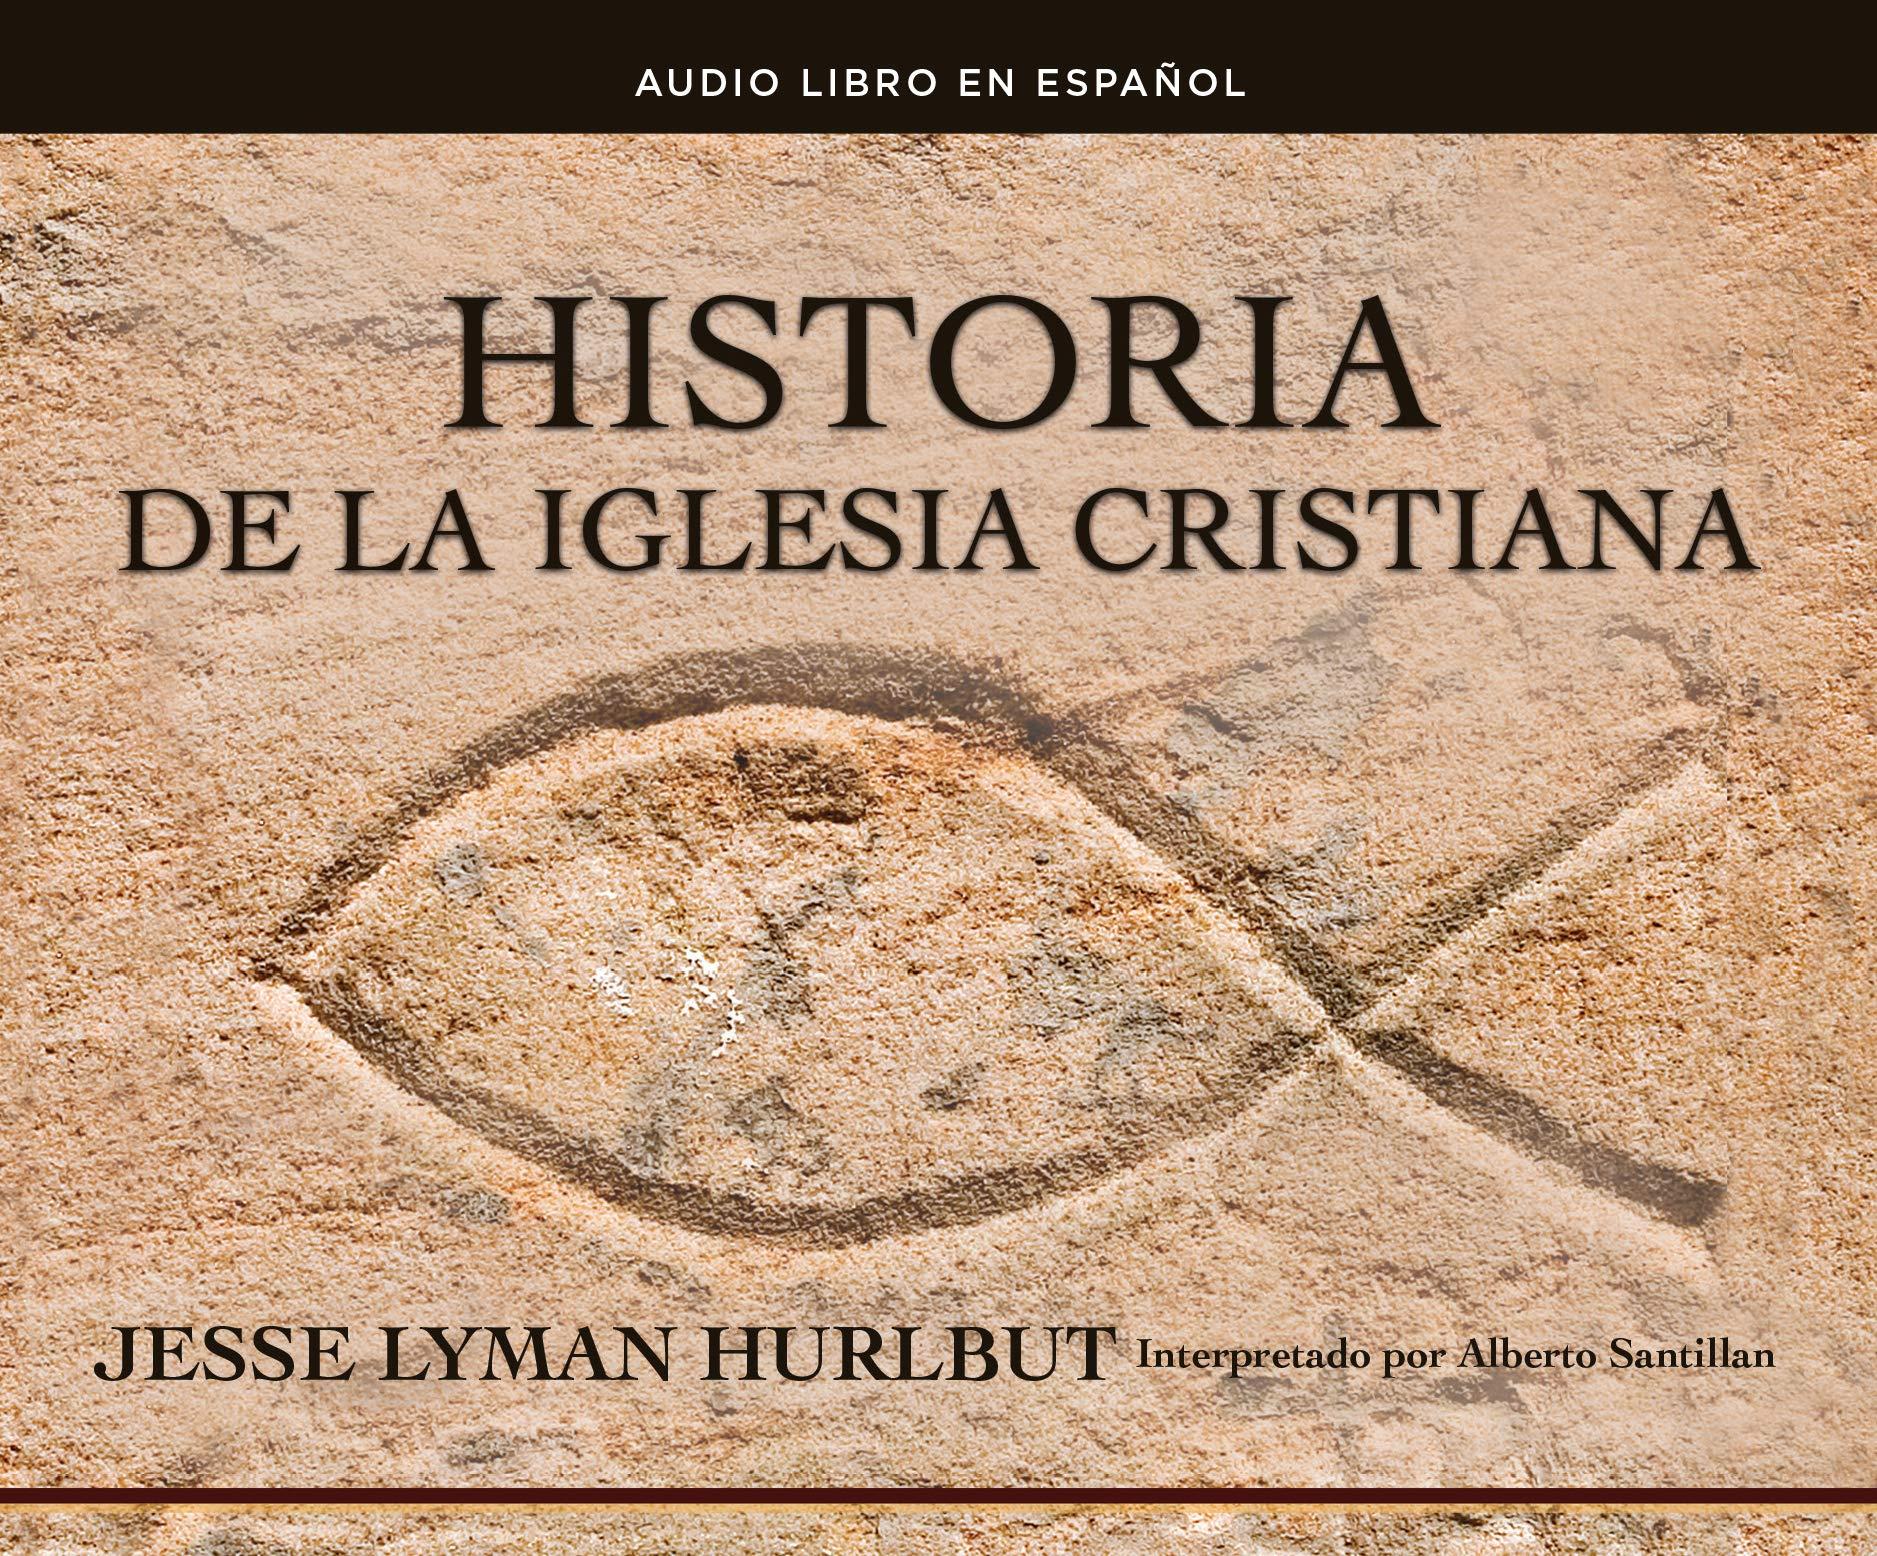 Historia de la Iglesia Cristiana History of the Christian C: Amazon.es: L Hurlbut, Jesse: Libros en idiomas extranjeros